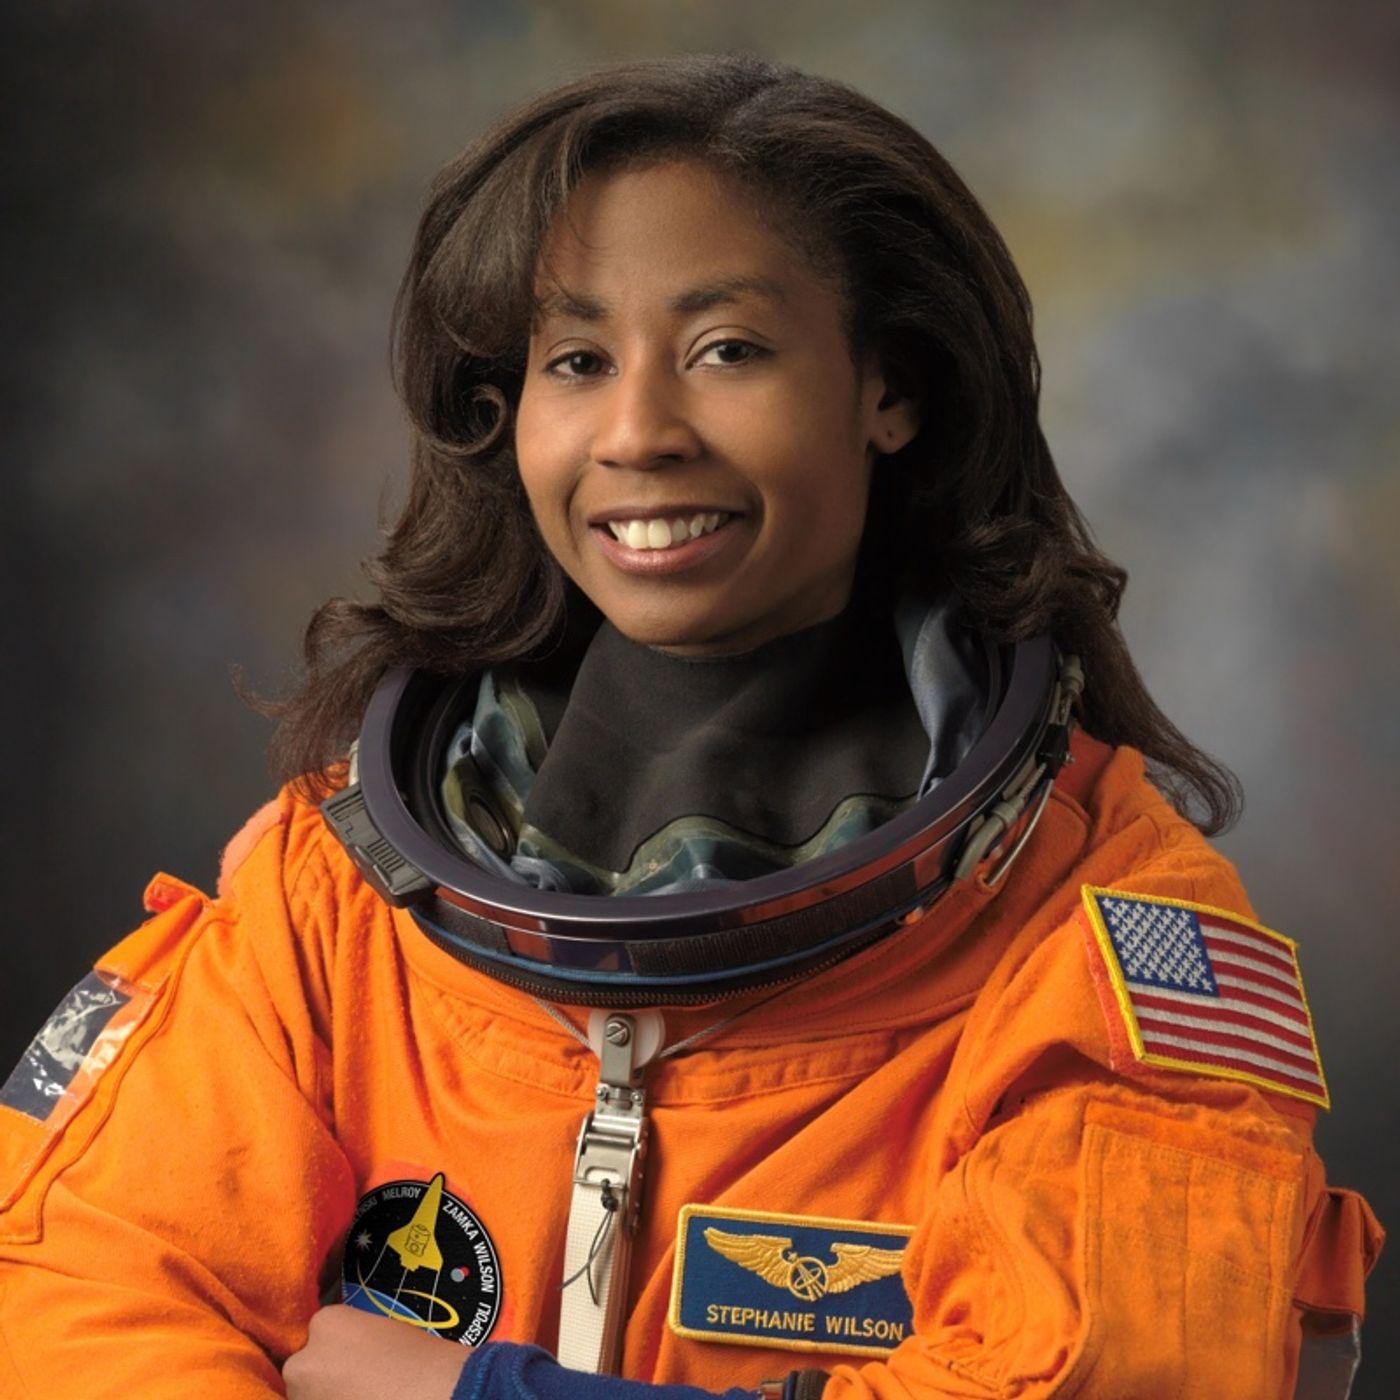 Atlanta Earthwork Installation to Honor NASA Astronaut Stephanie Wilson